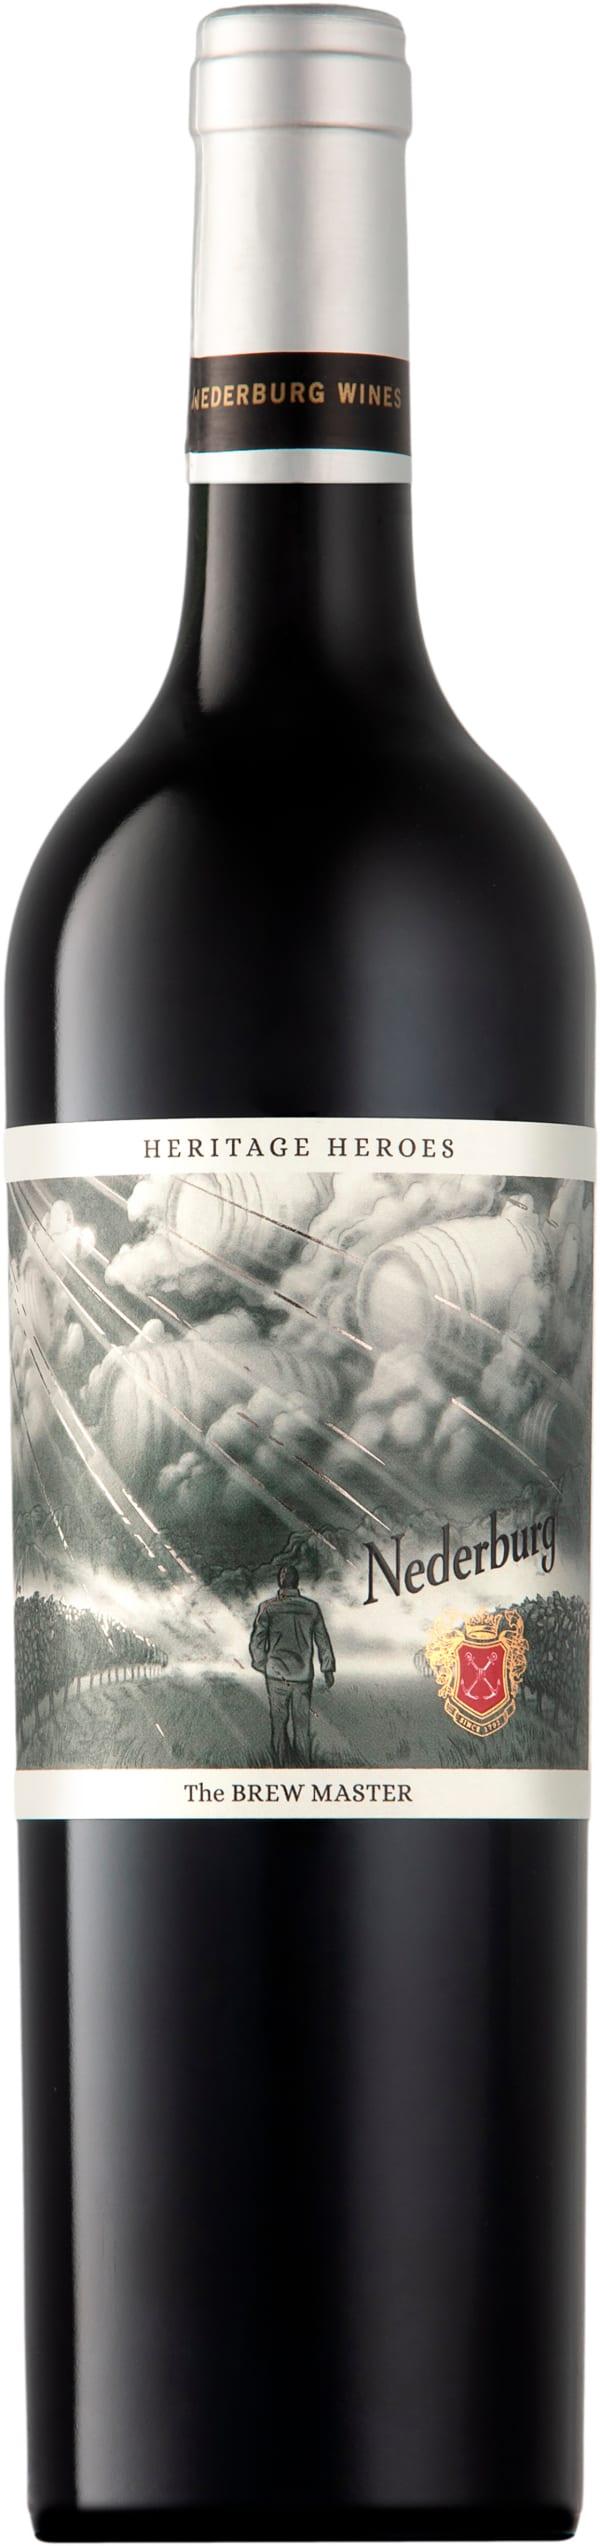 Nederburg The Brew Master 2015